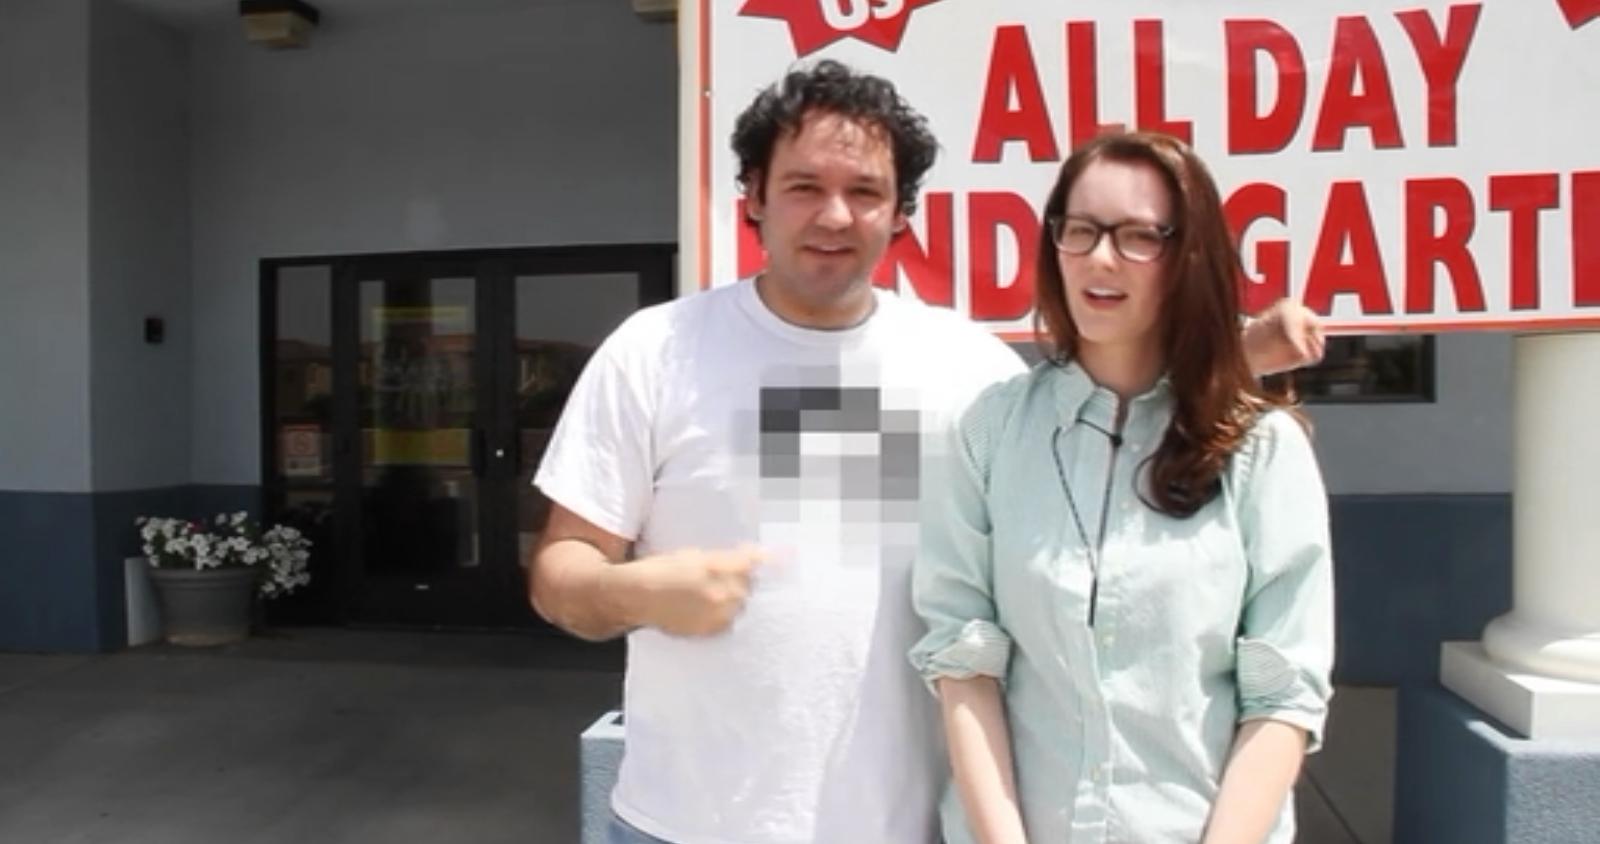 Samantha nathan and his censored shirt are waytoo extreme for your